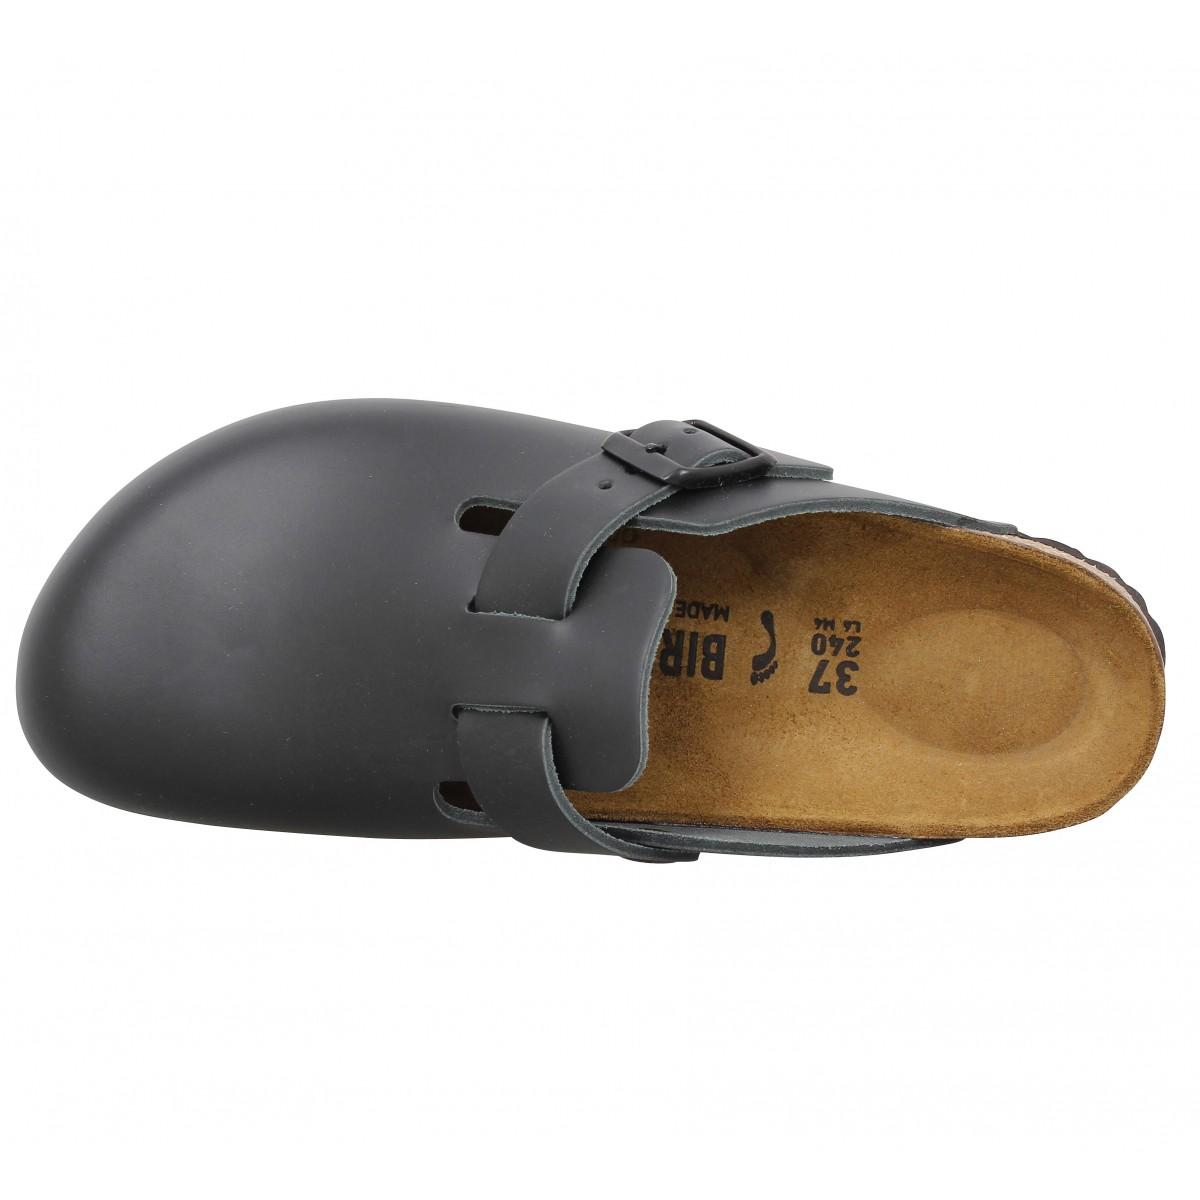 Birkenstock boston cuir homme noir homme | Fanny chaussures